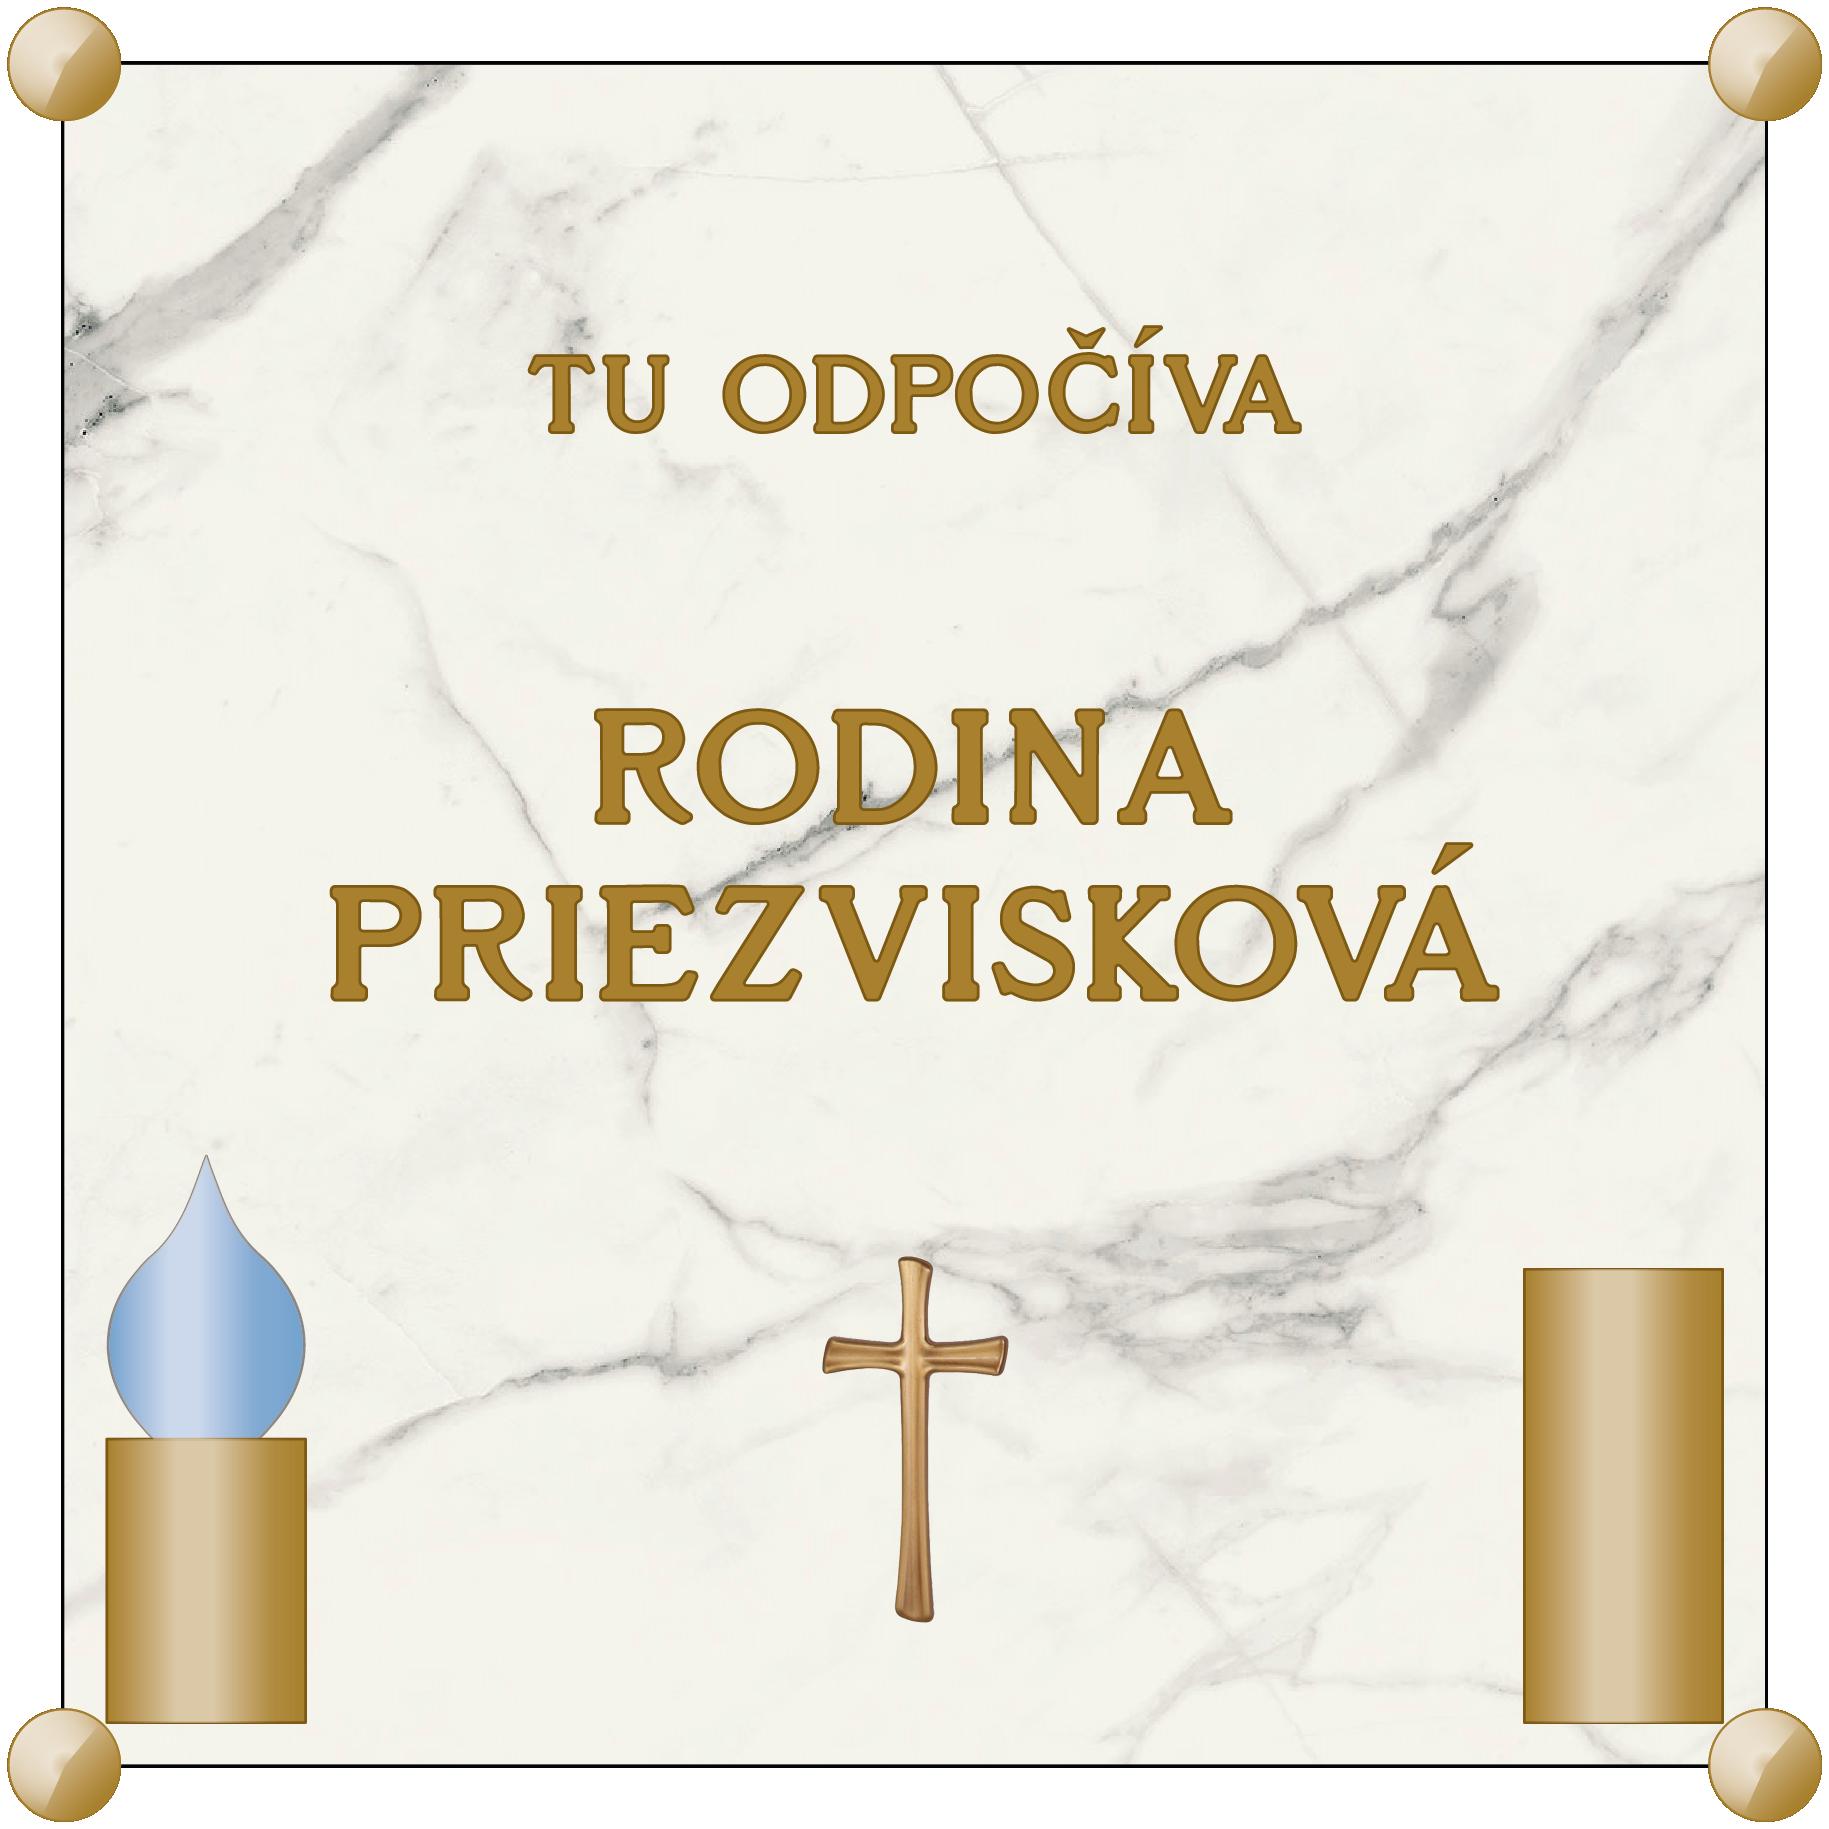 ROMANO_60x60_60x60_1c